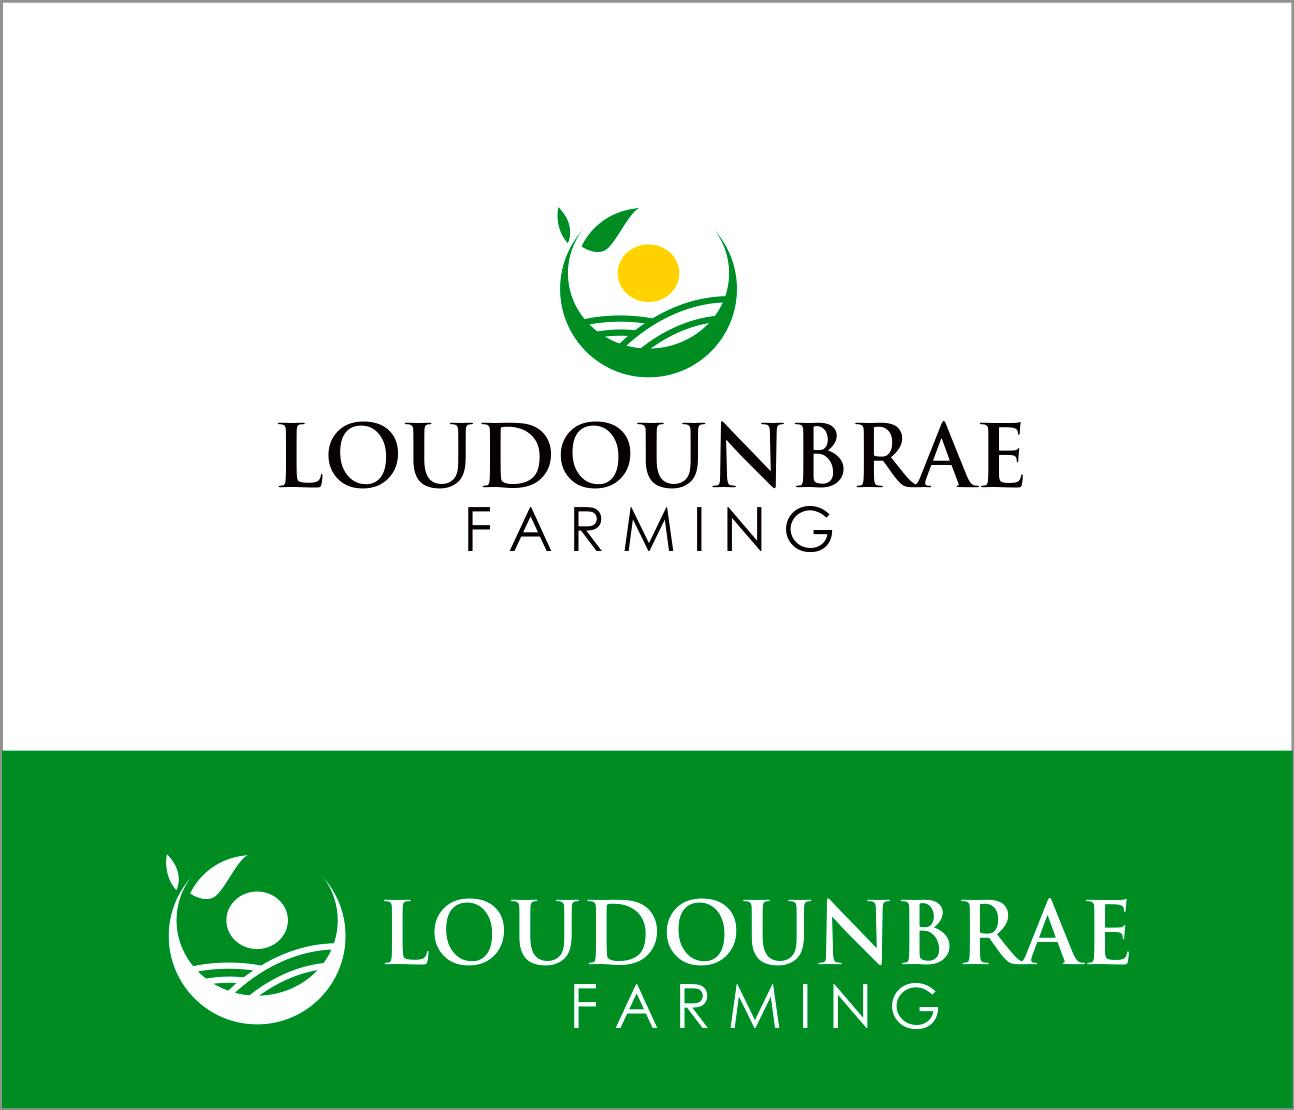 Logo Design by Armada Jamaluddin - Entry No. 71 in the Logo Design Contest Creative Logo Design for Loudounbrae Farming.